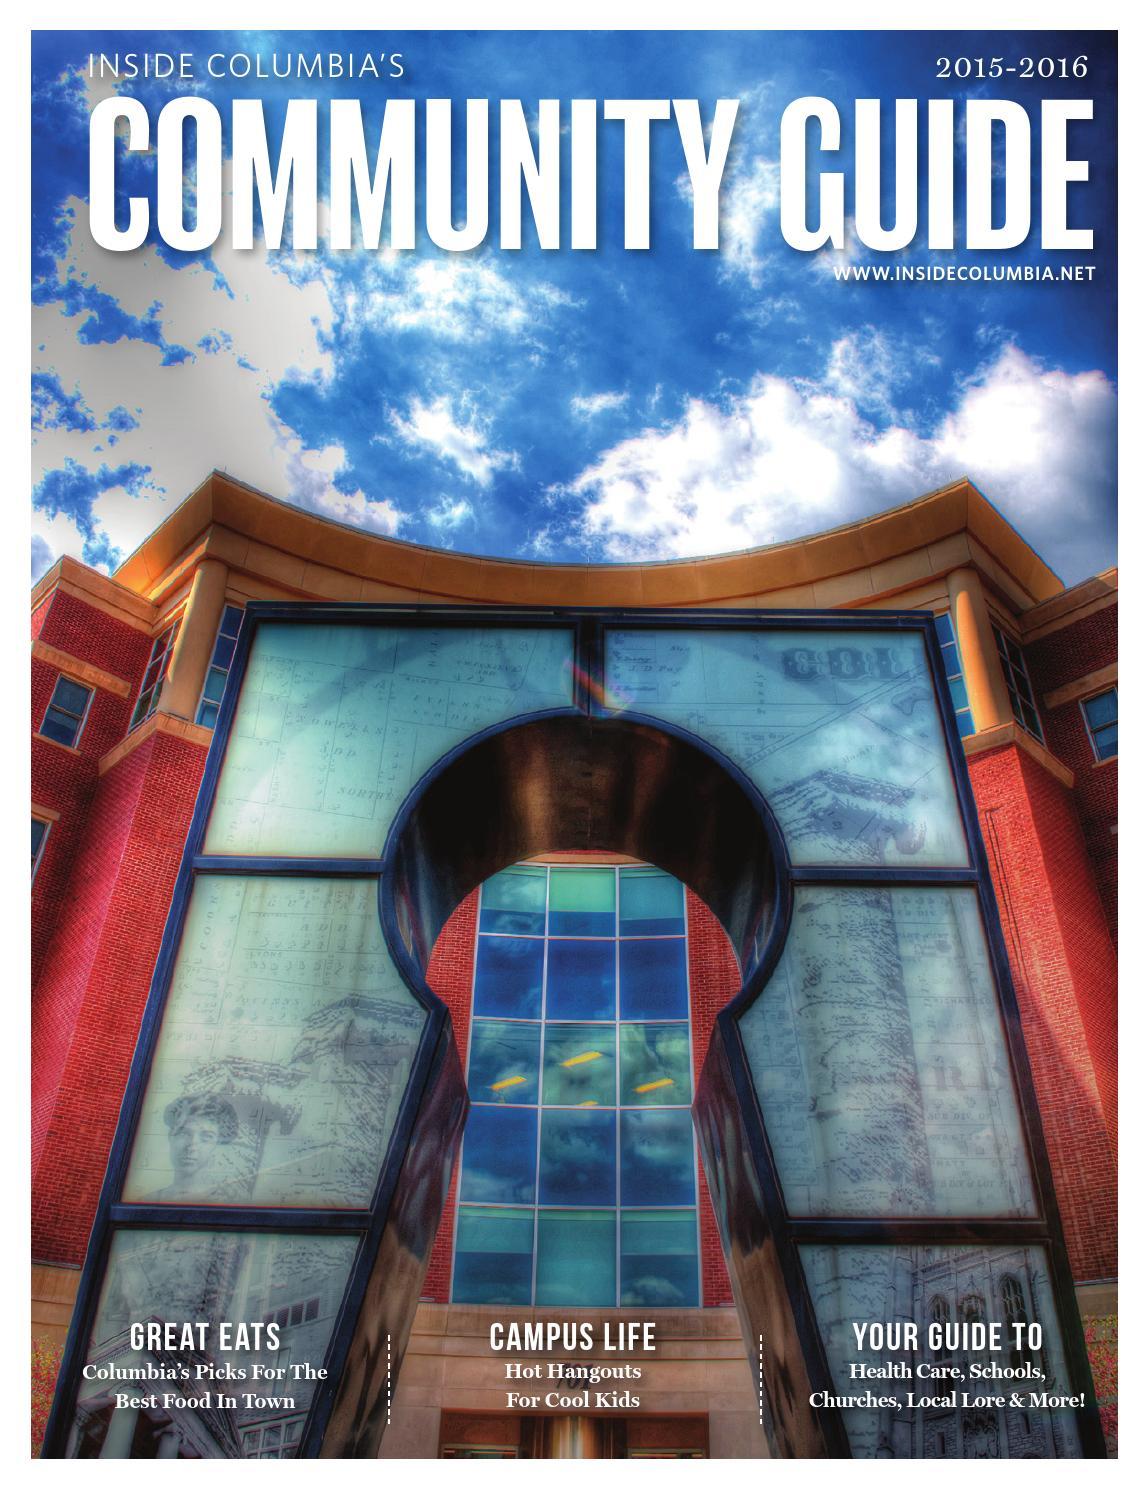 Community Guide 2015-2016 by Inside Columbia Magazine - issuu